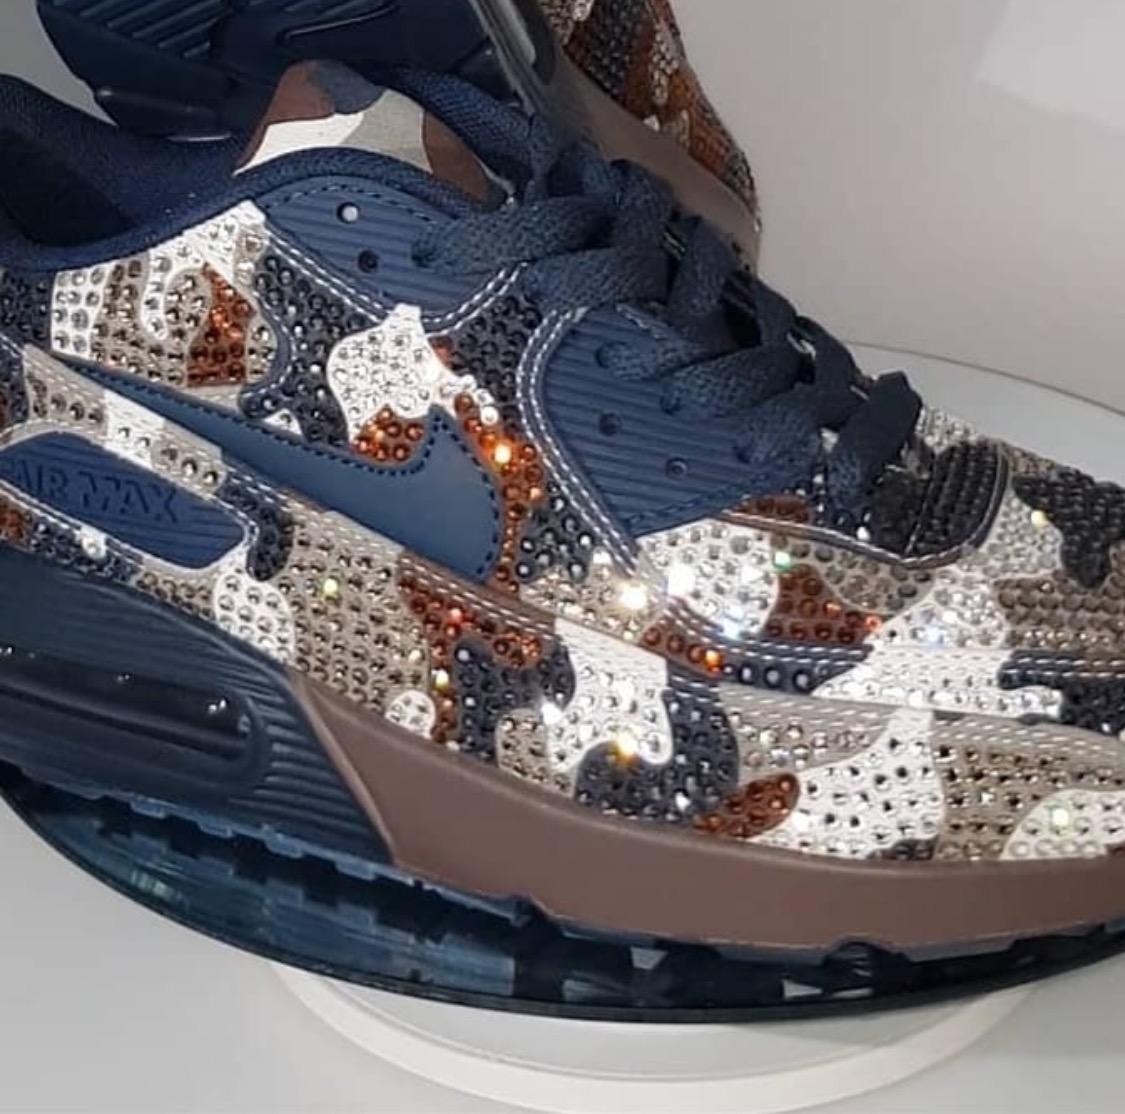 Embellished Nike kicks